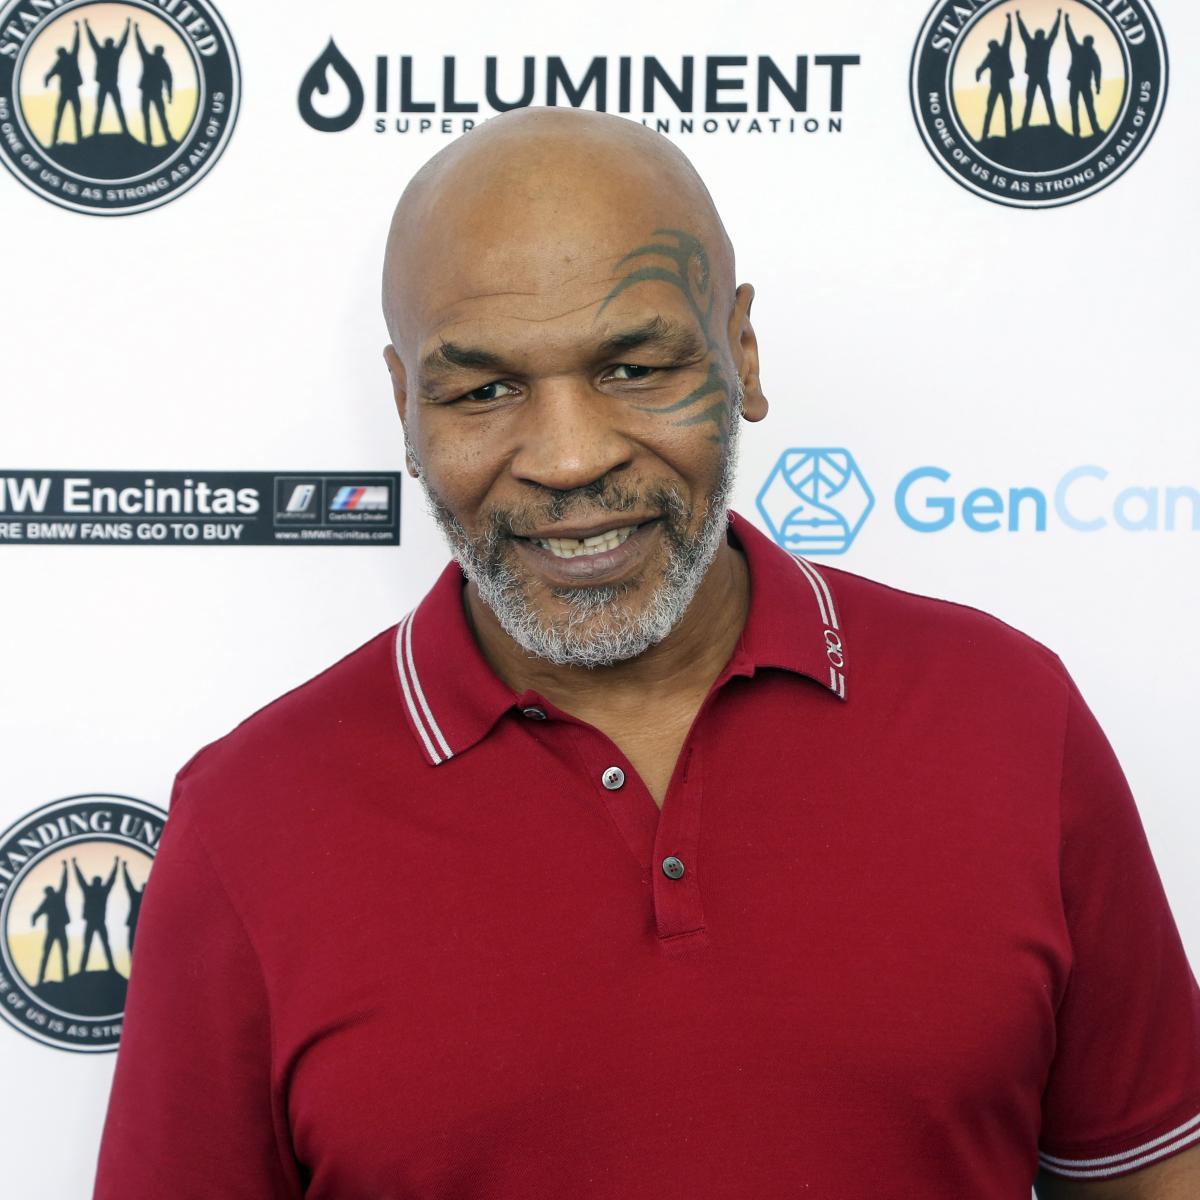 Mike Tyson vs. Roy Jones Jr.: Twitter Decides Winner After Superfight Ruled Draw